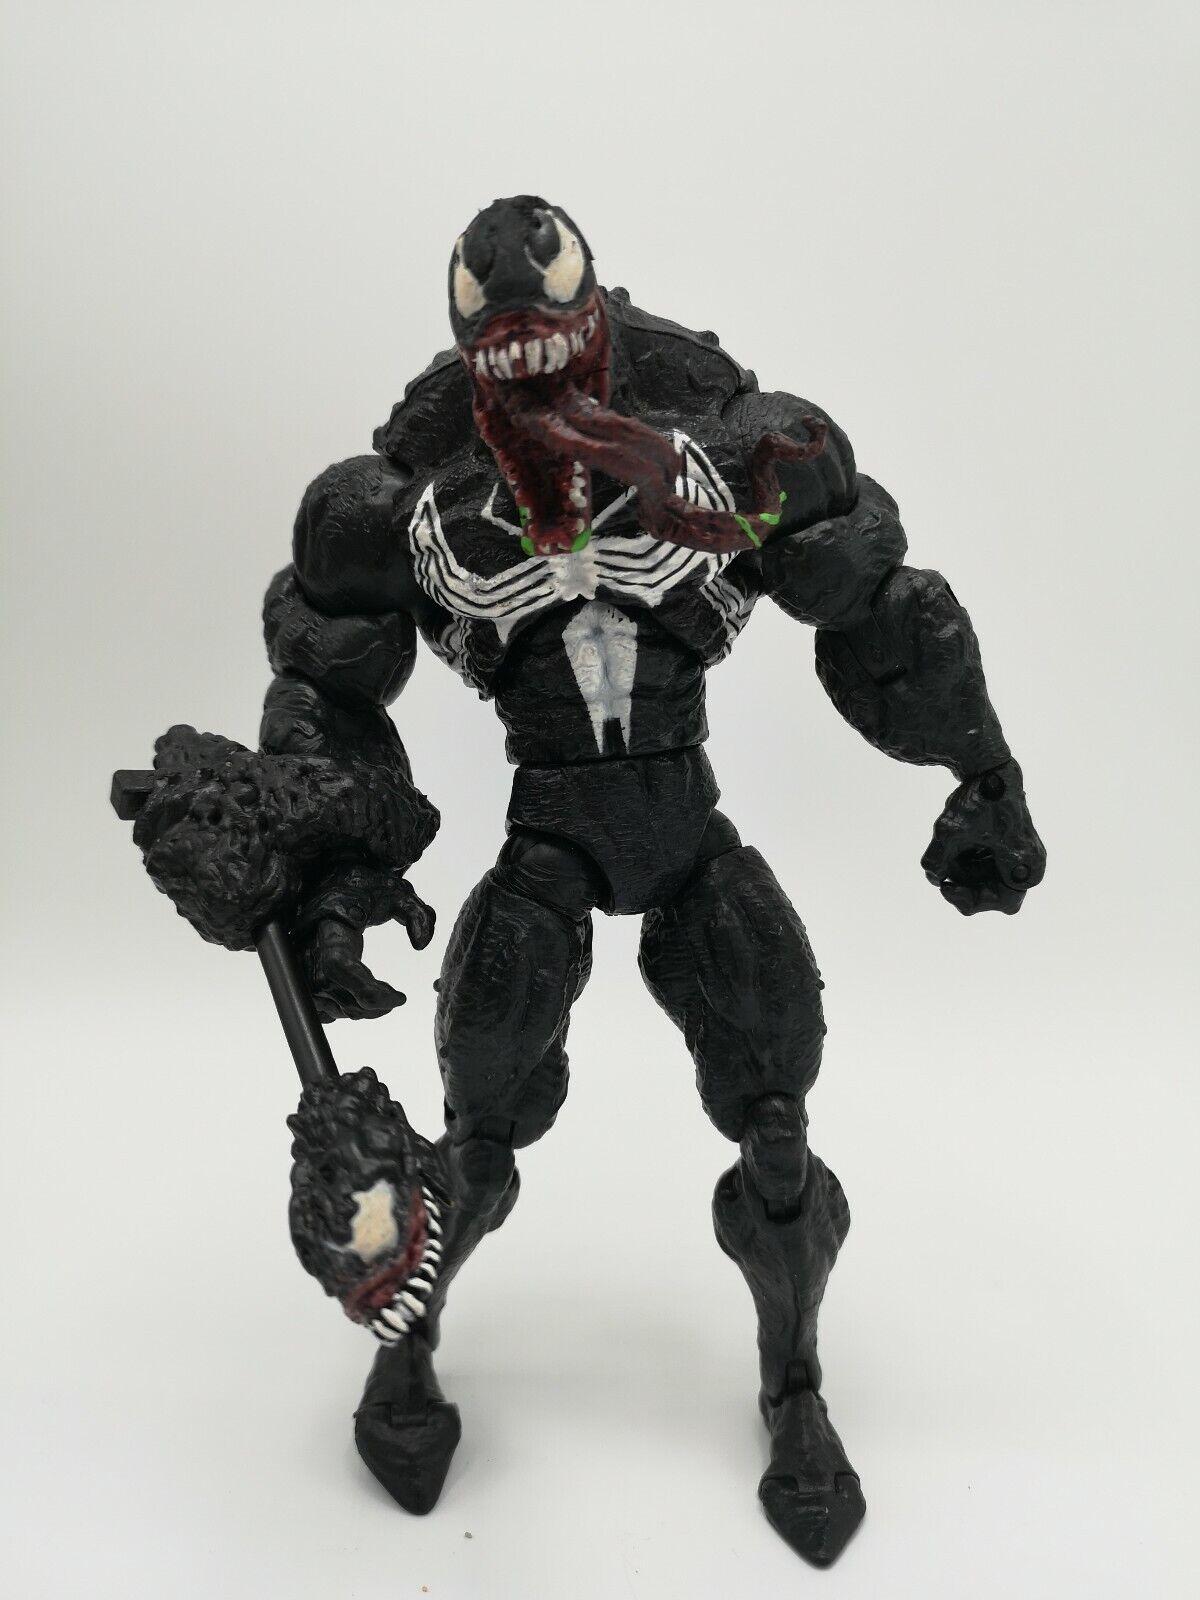 el mejor servicio post-venta Venom simbiota Blast Marvel Marvel Marvel Legends Amazing Spider Man 6  figura Juguetebiz 2006  tienda de venta